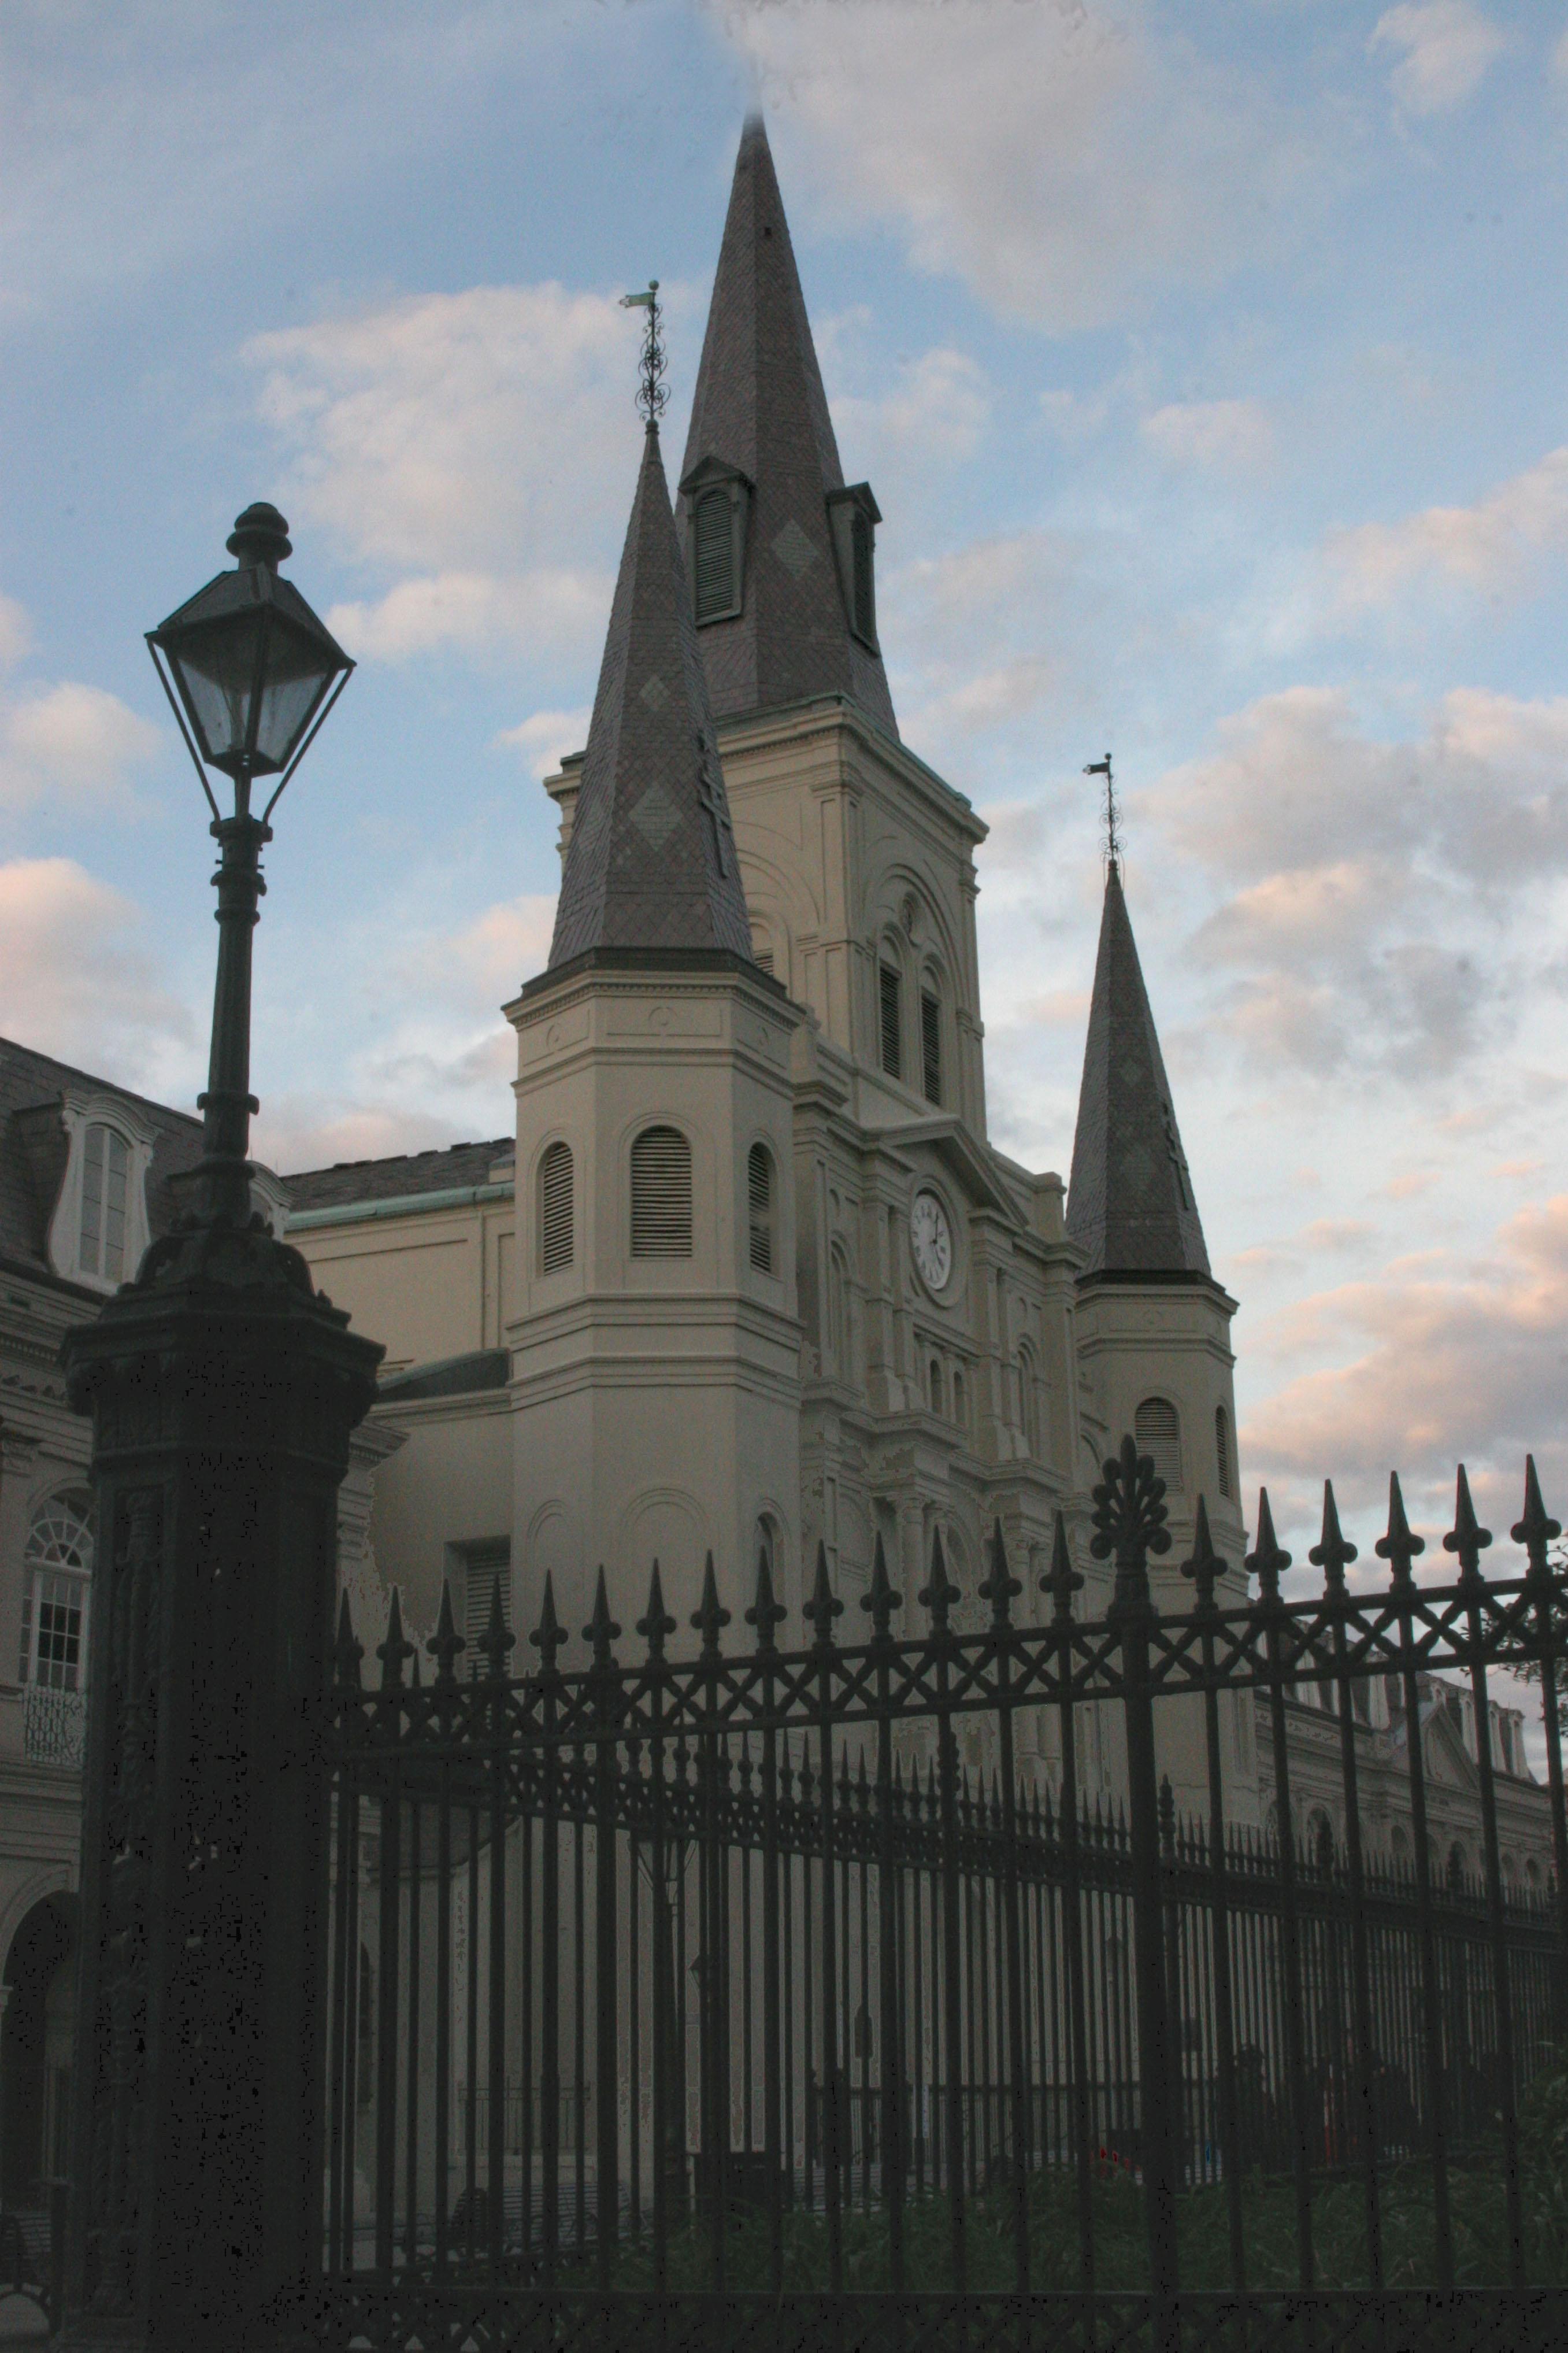 http://www.finebooksmagazine.com/fine_books_blog/images/cathedral%20side%20fence%20adj.jpg